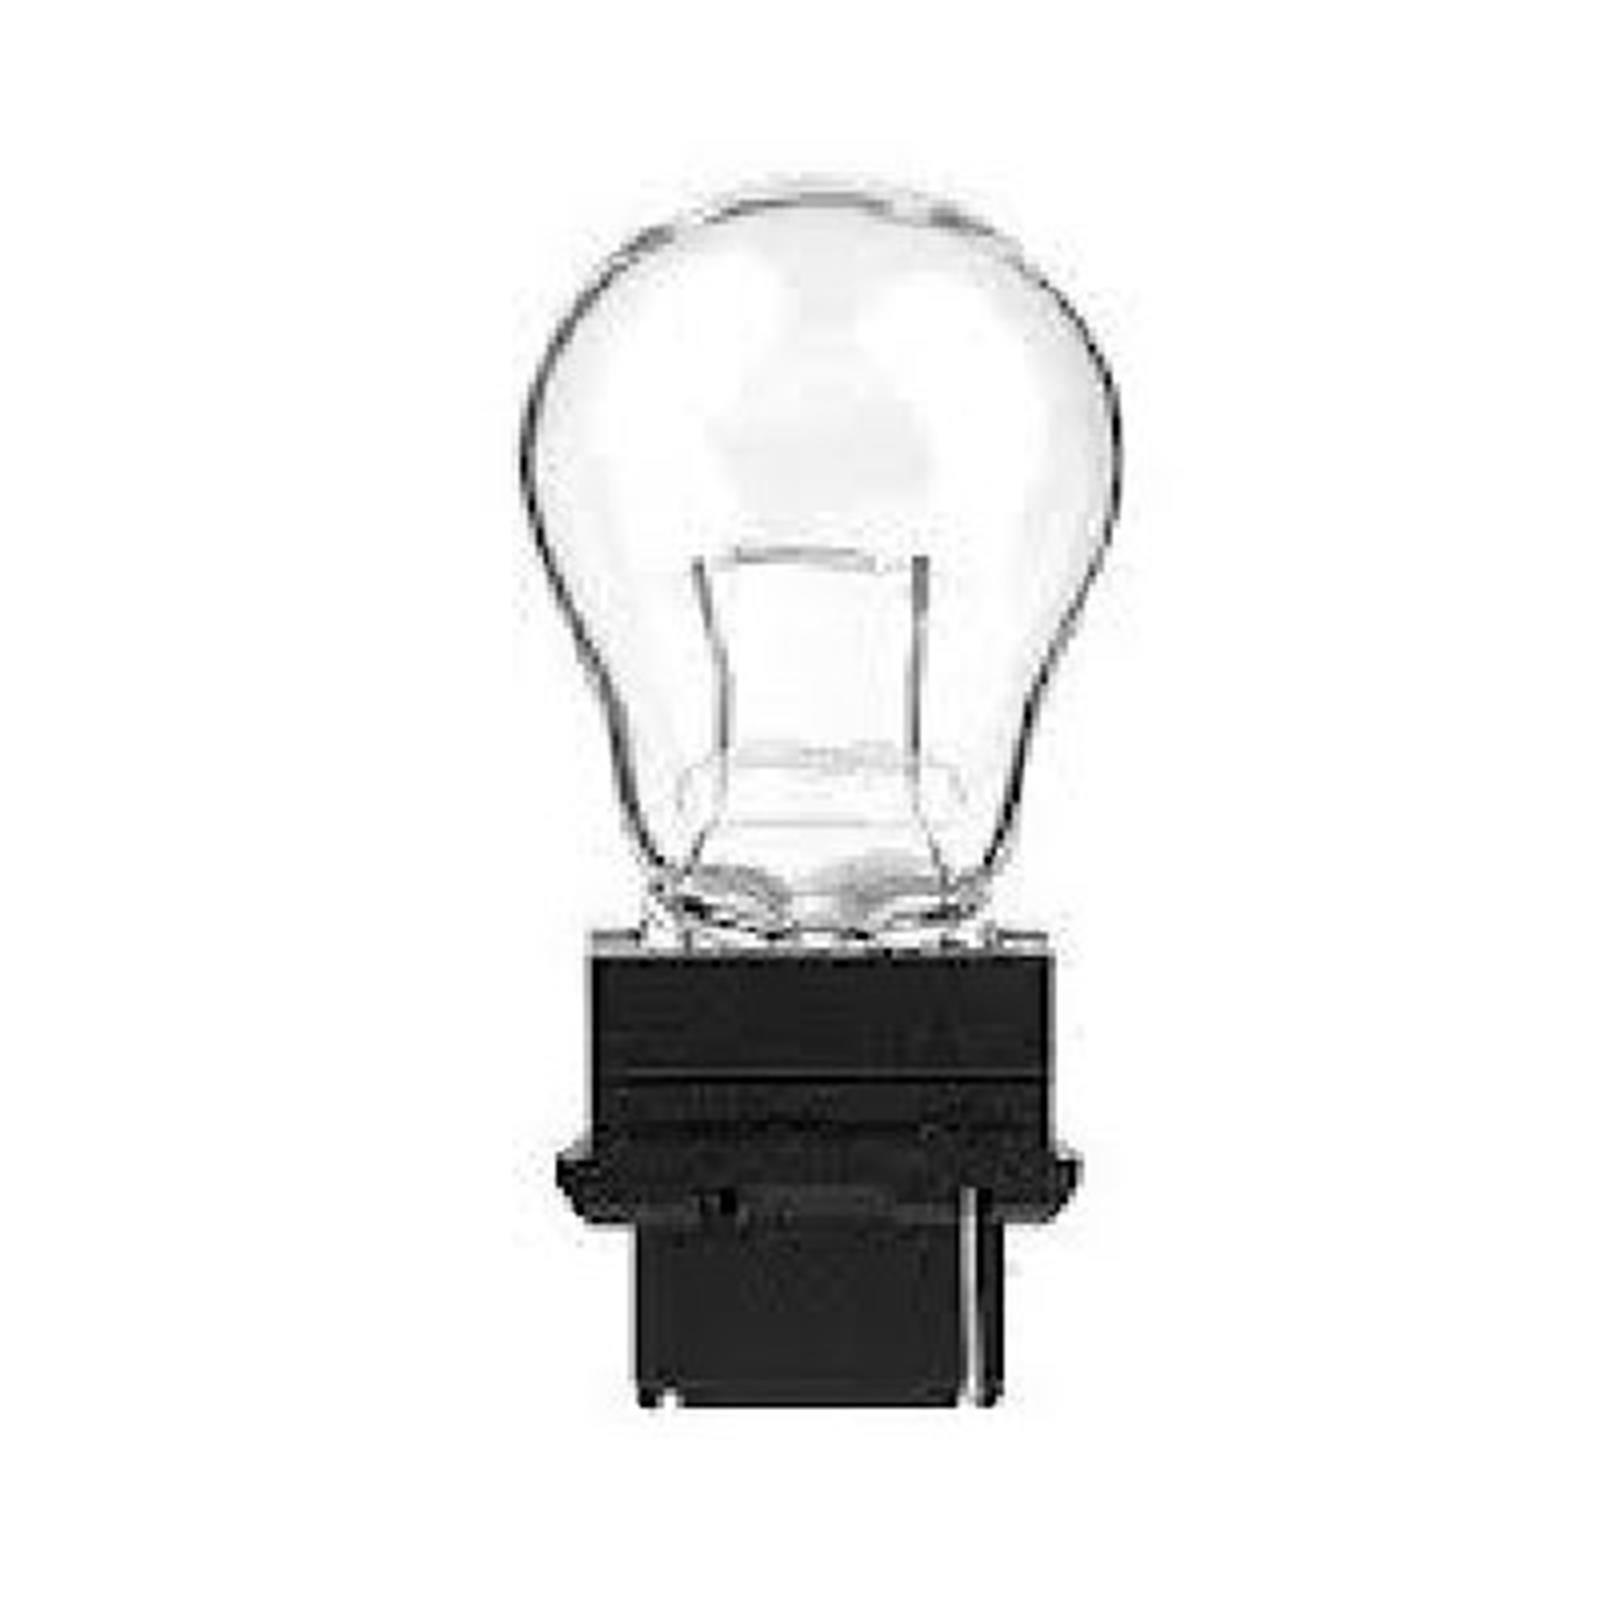 10 Qty. Halco 2.10A KRYPTON S8 Plastic 12V Wedge 3156K 26w 12.8v Miniature Krypton Fill Gas Lamp Bulb